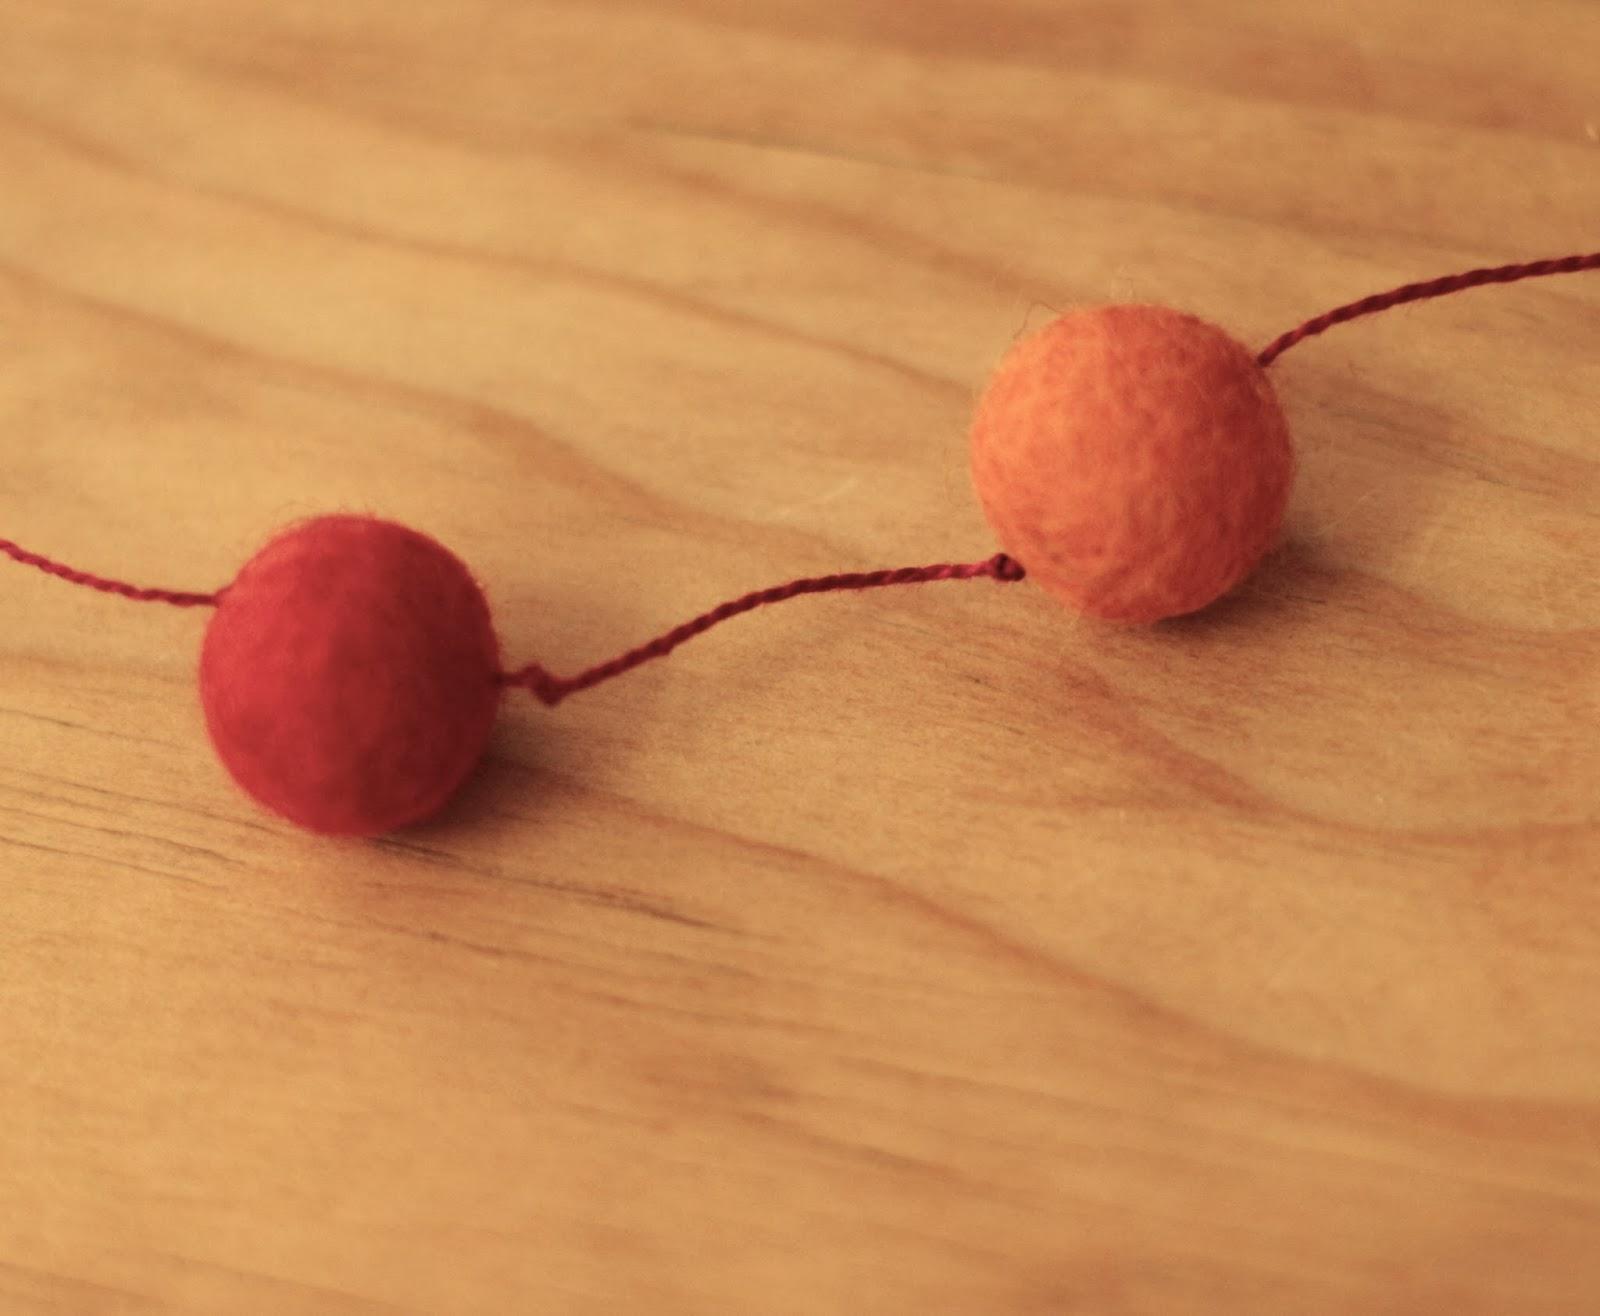 Needle through balls